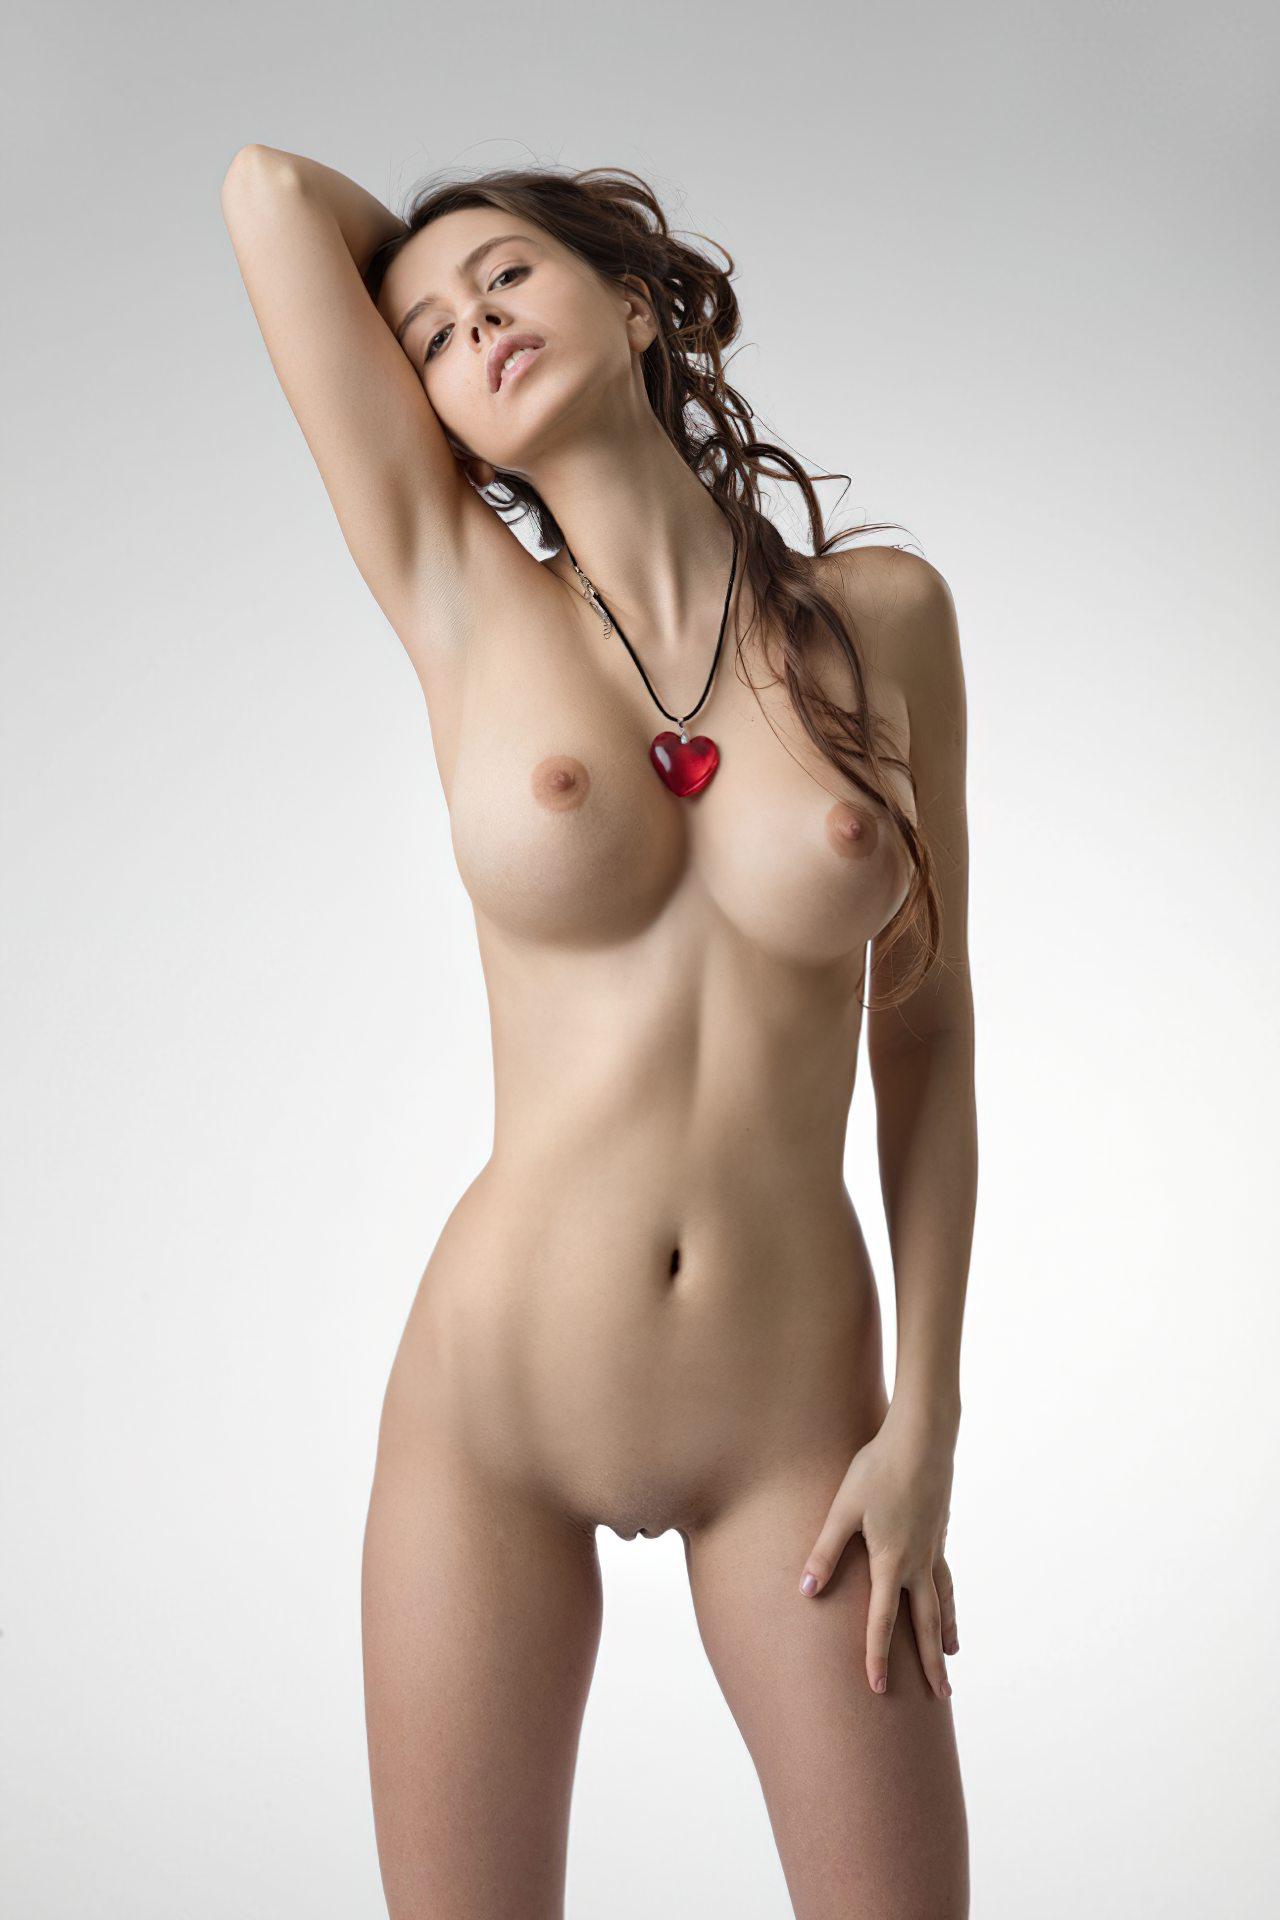 Fotos Mulheres Despidas (1)